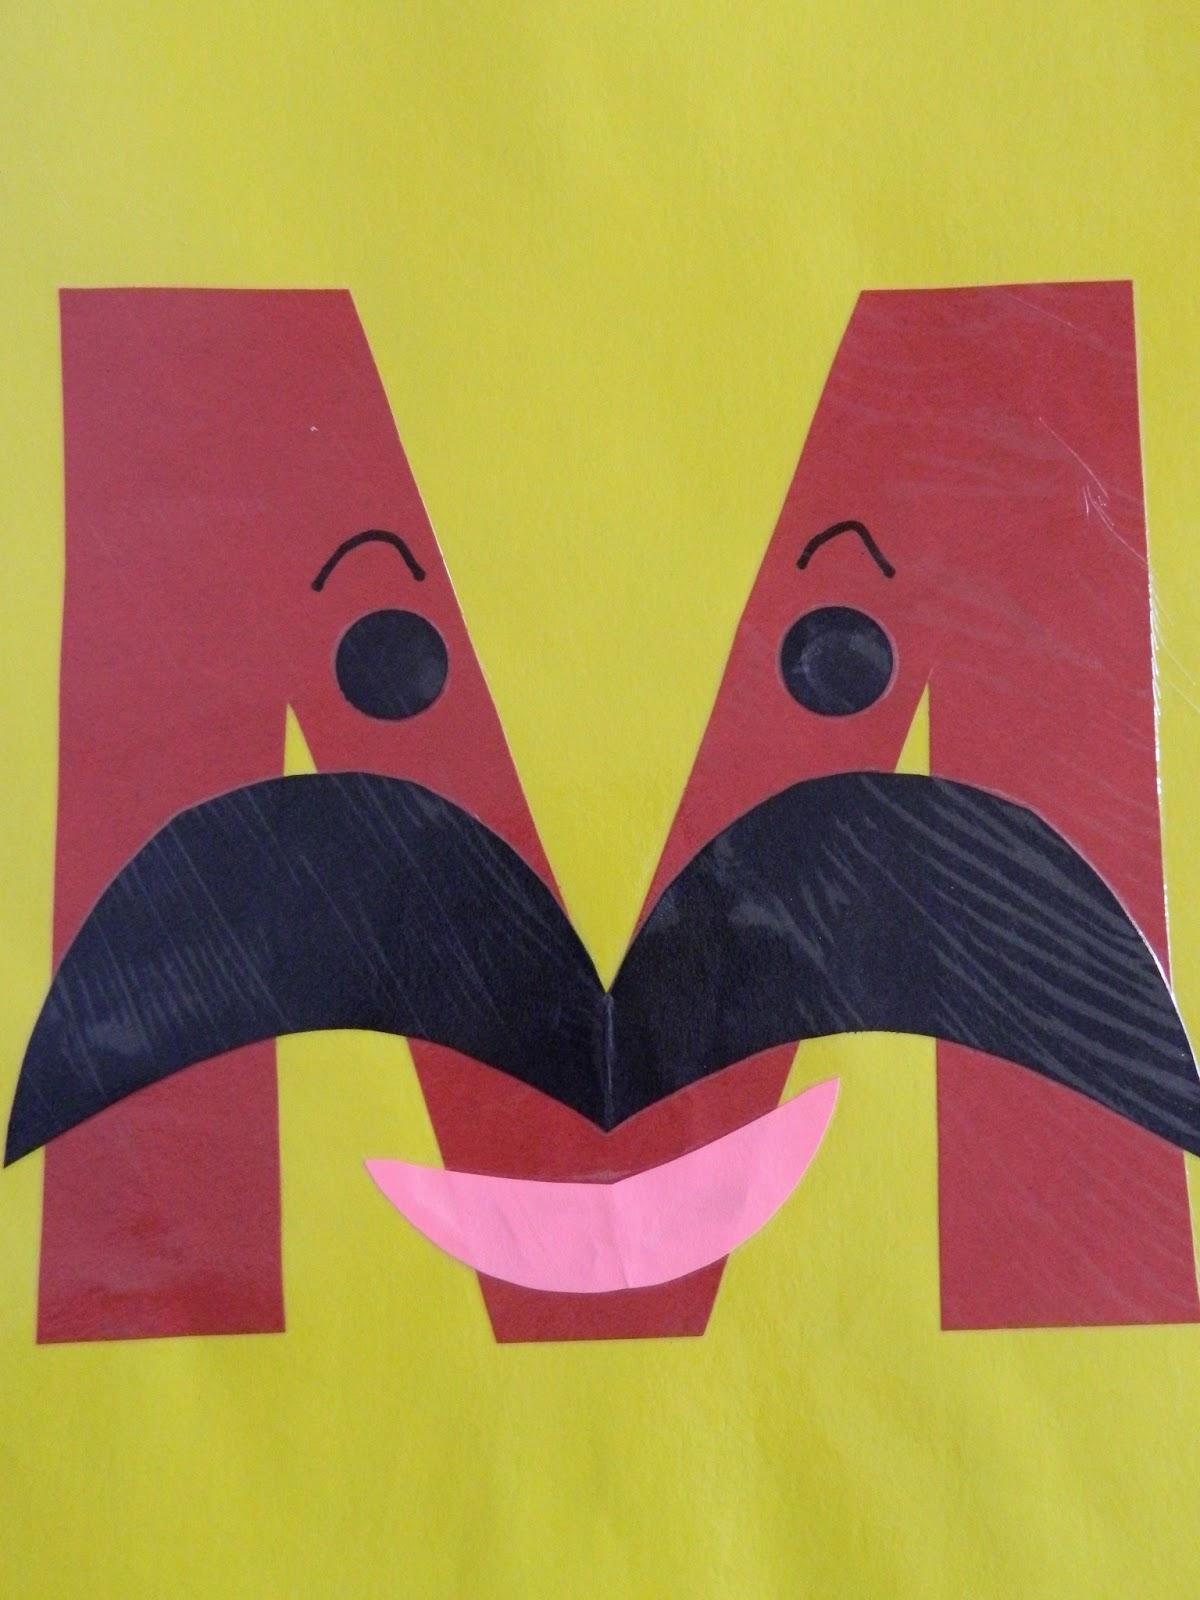 The Vintage Umbrella Preschool Alphabet Projects Letters I P